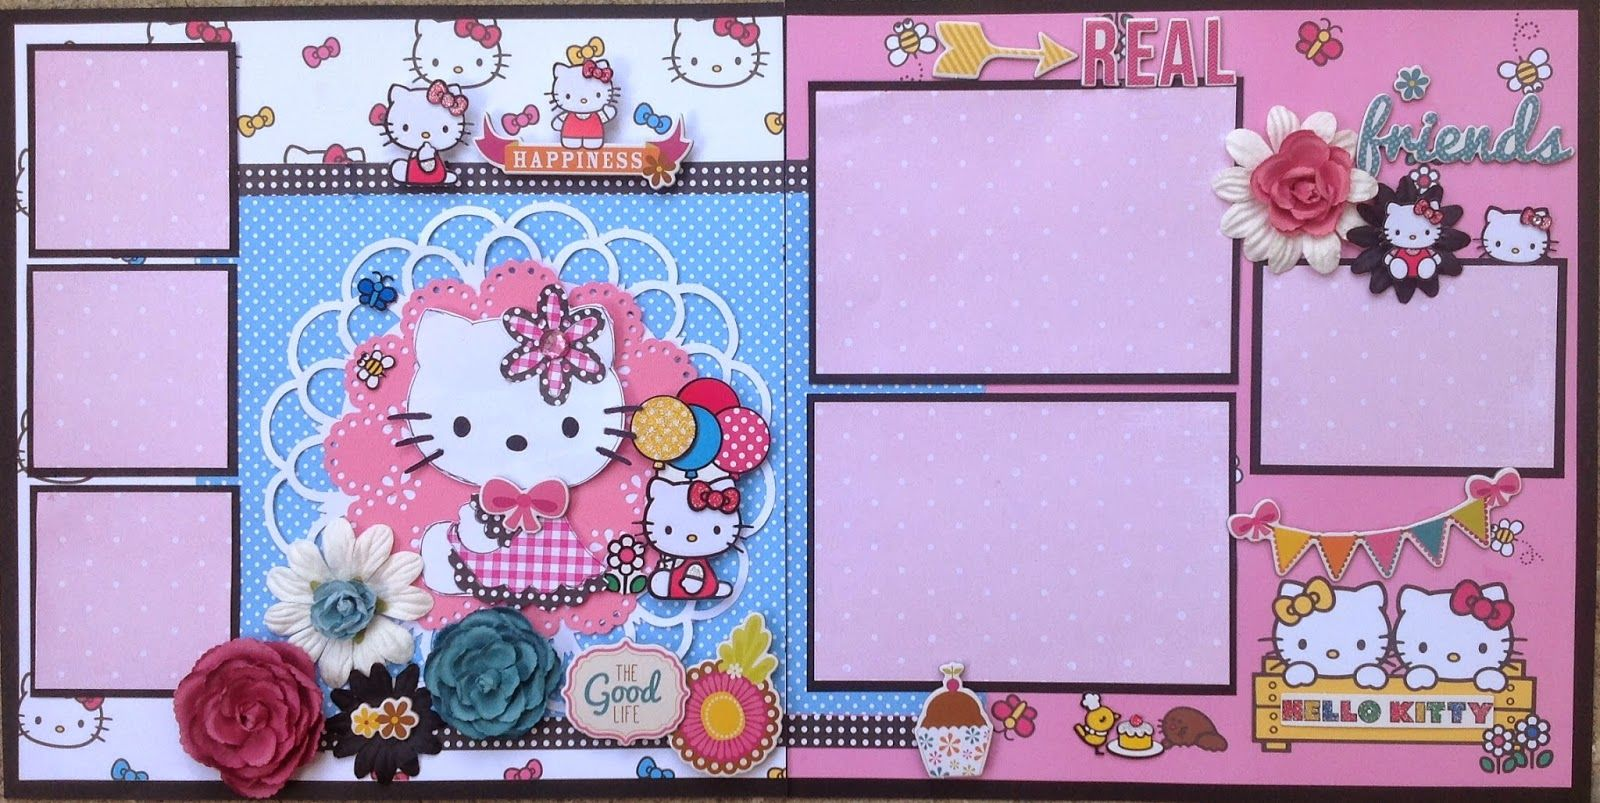 Amazing grace hello kitty baby scrapbookscrapbook layoutsamazing